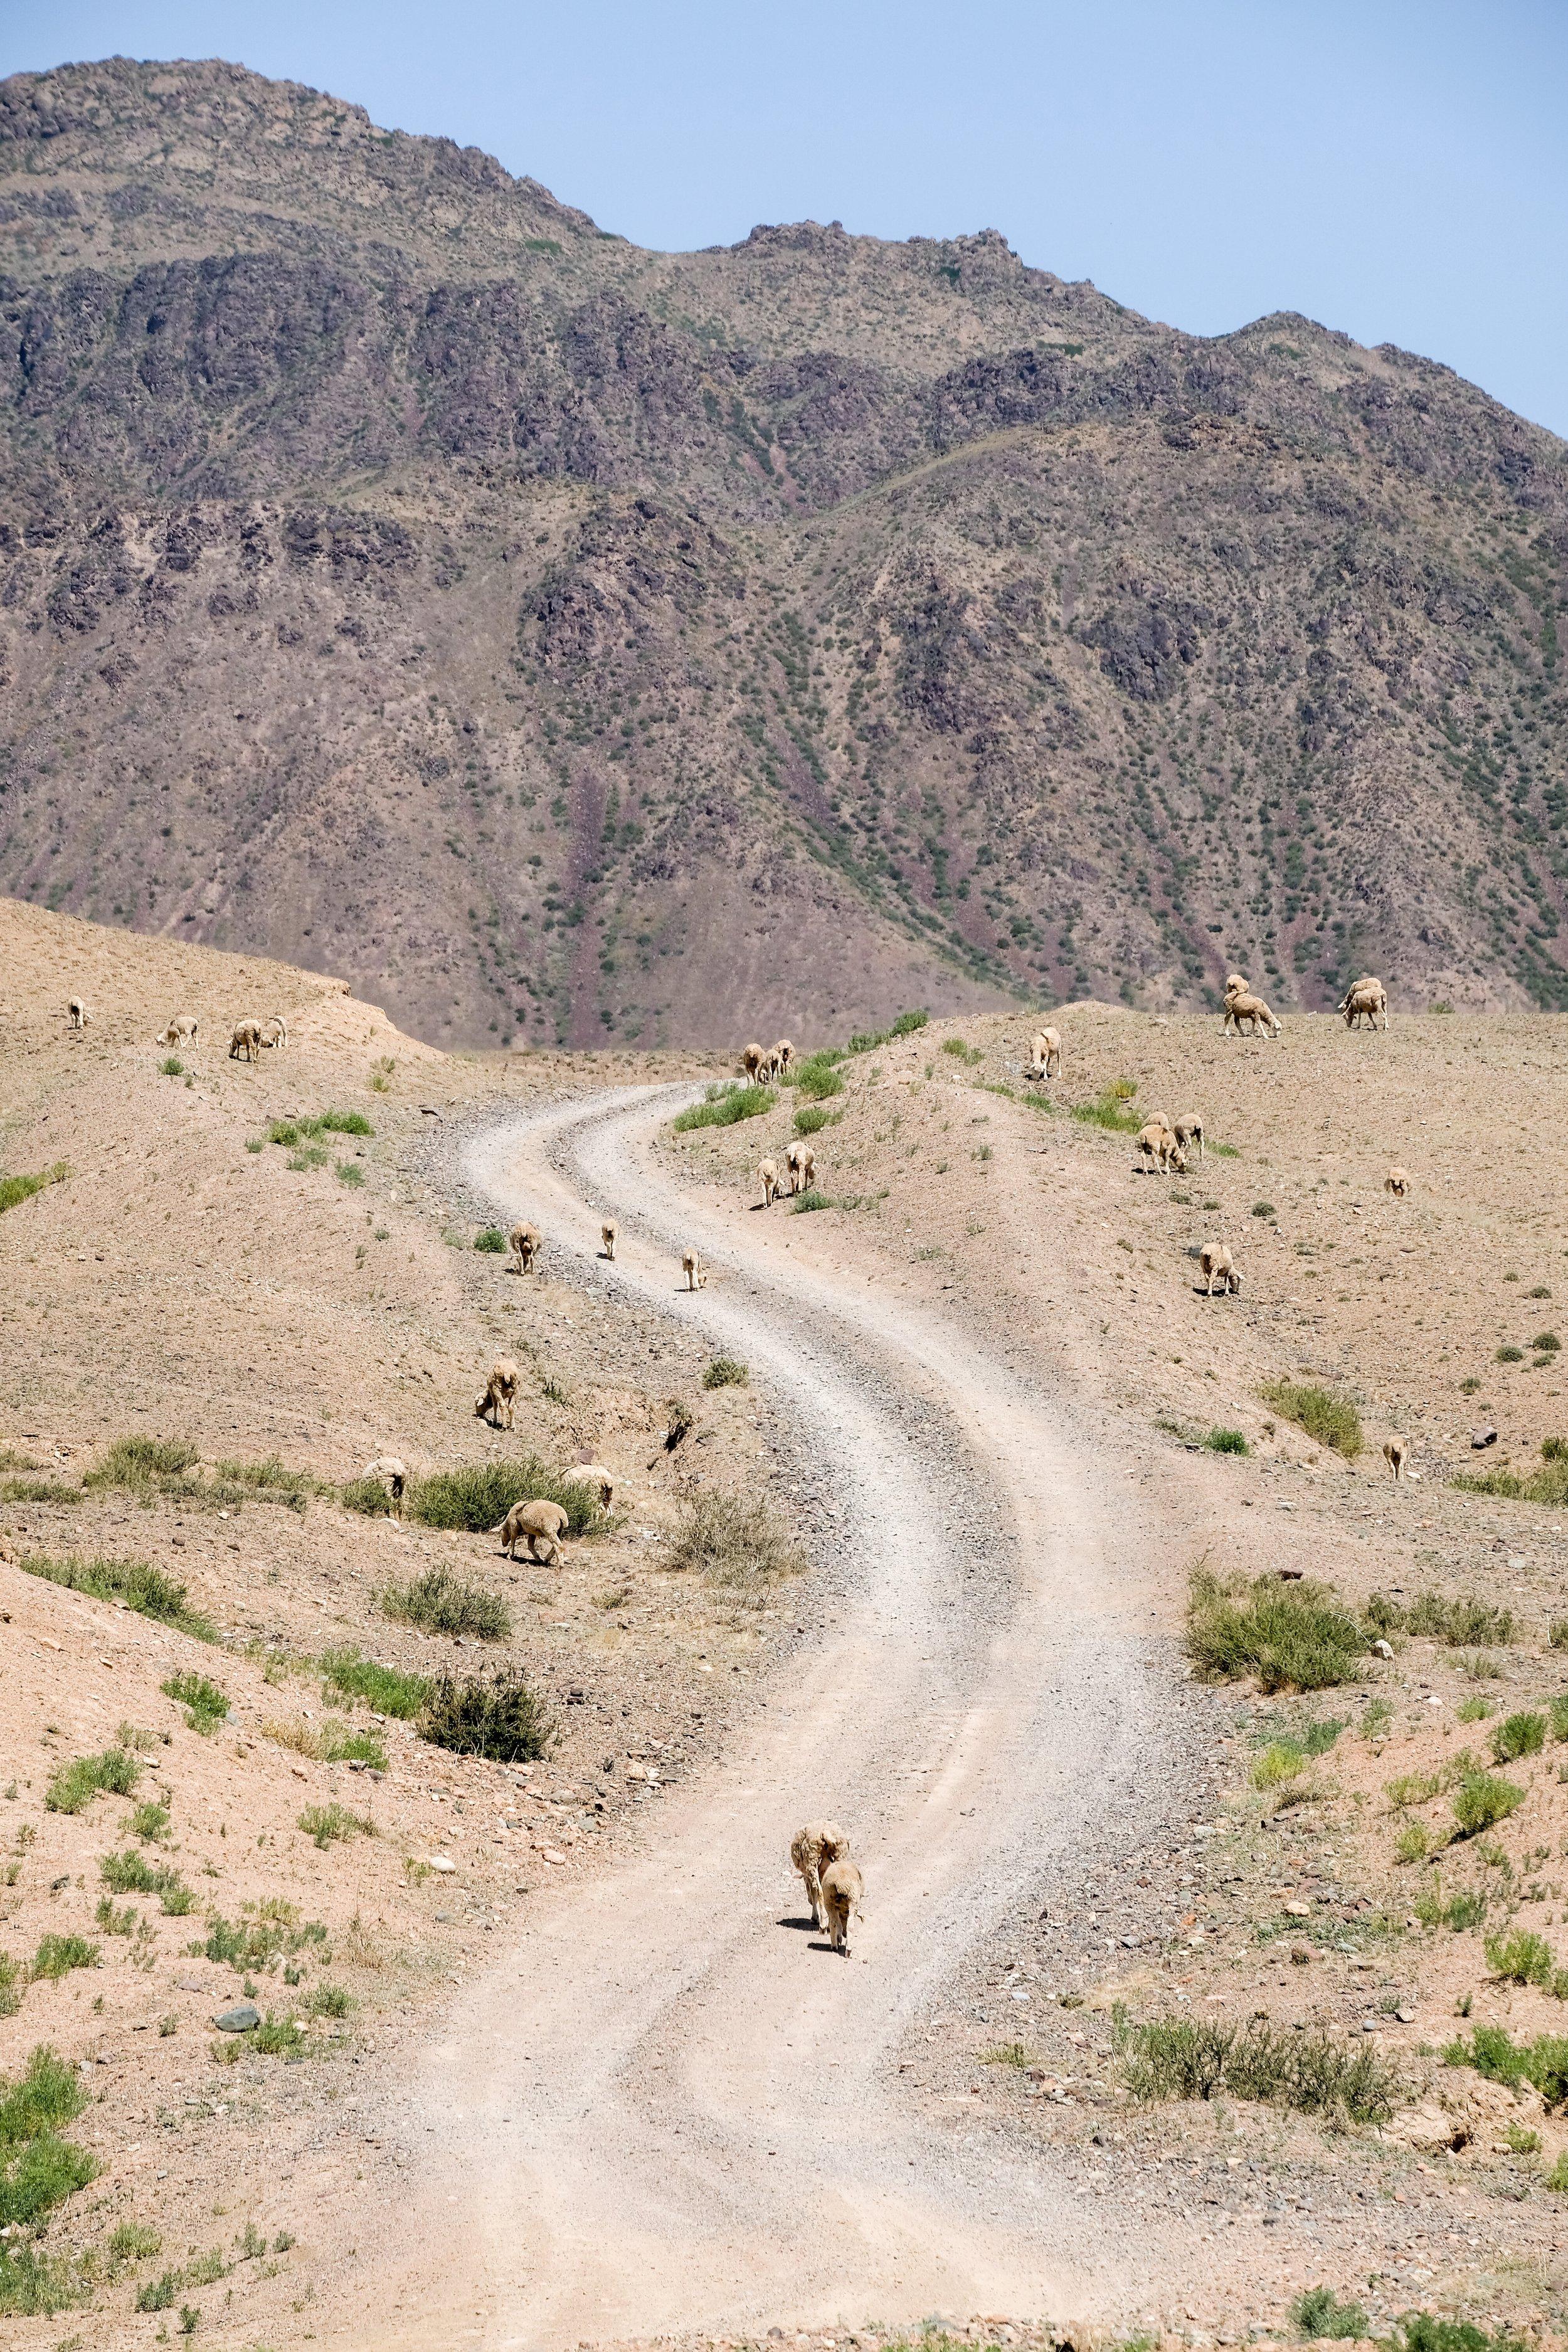 kazakh-corner-route-5082_35424407136_o.jpg